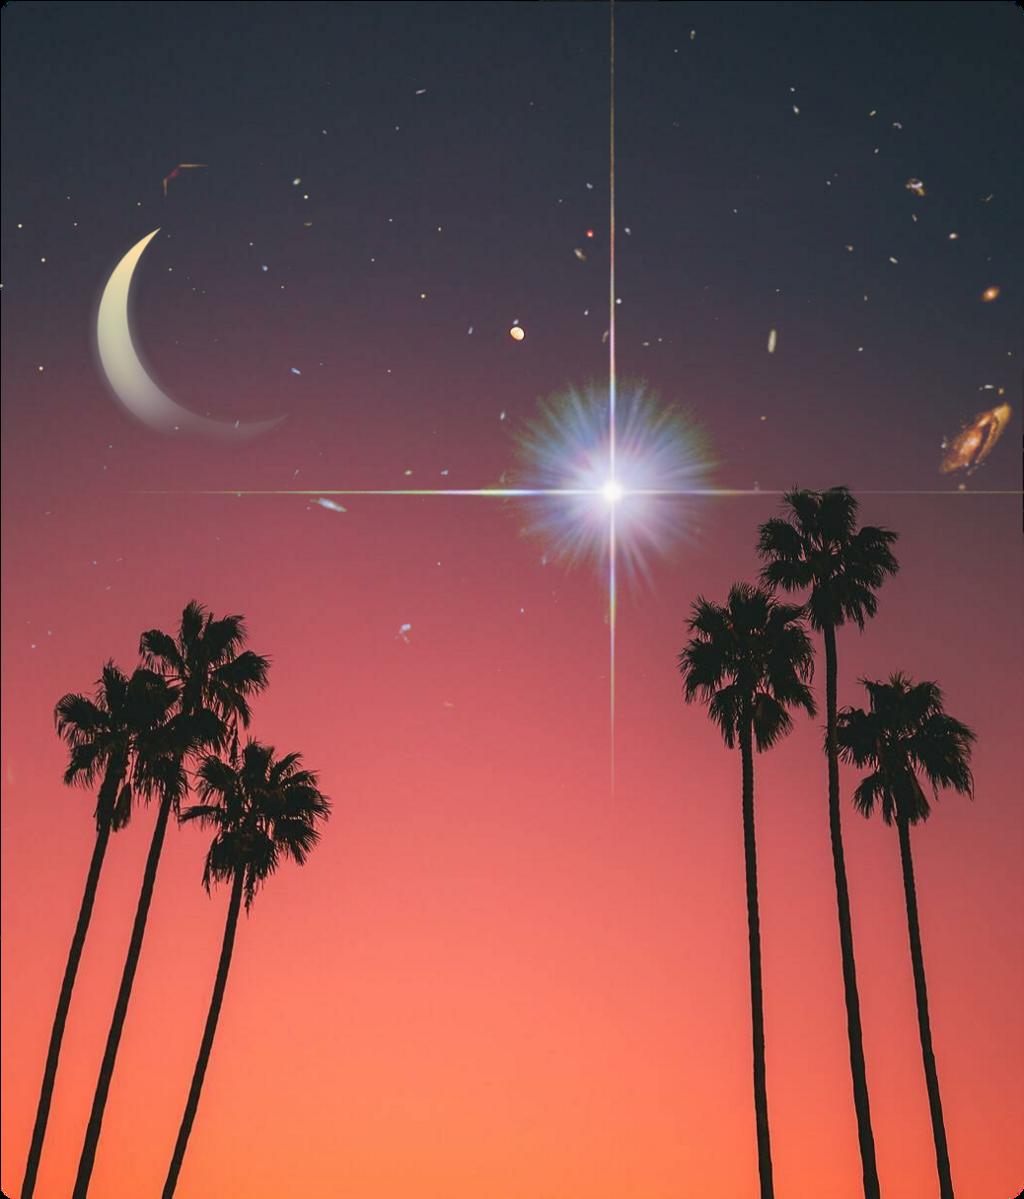 #stickerremix #freesticker #freetouse #freetoedit #overlay #blend #ftu #freetouse #fte #universe #stars #night #sky #kosmos #planets #cosmos #universe #brightstar #eveningsky #romantic #background #freebackground #starsparklesstickerremix #sparkle #sparkling #sparkly